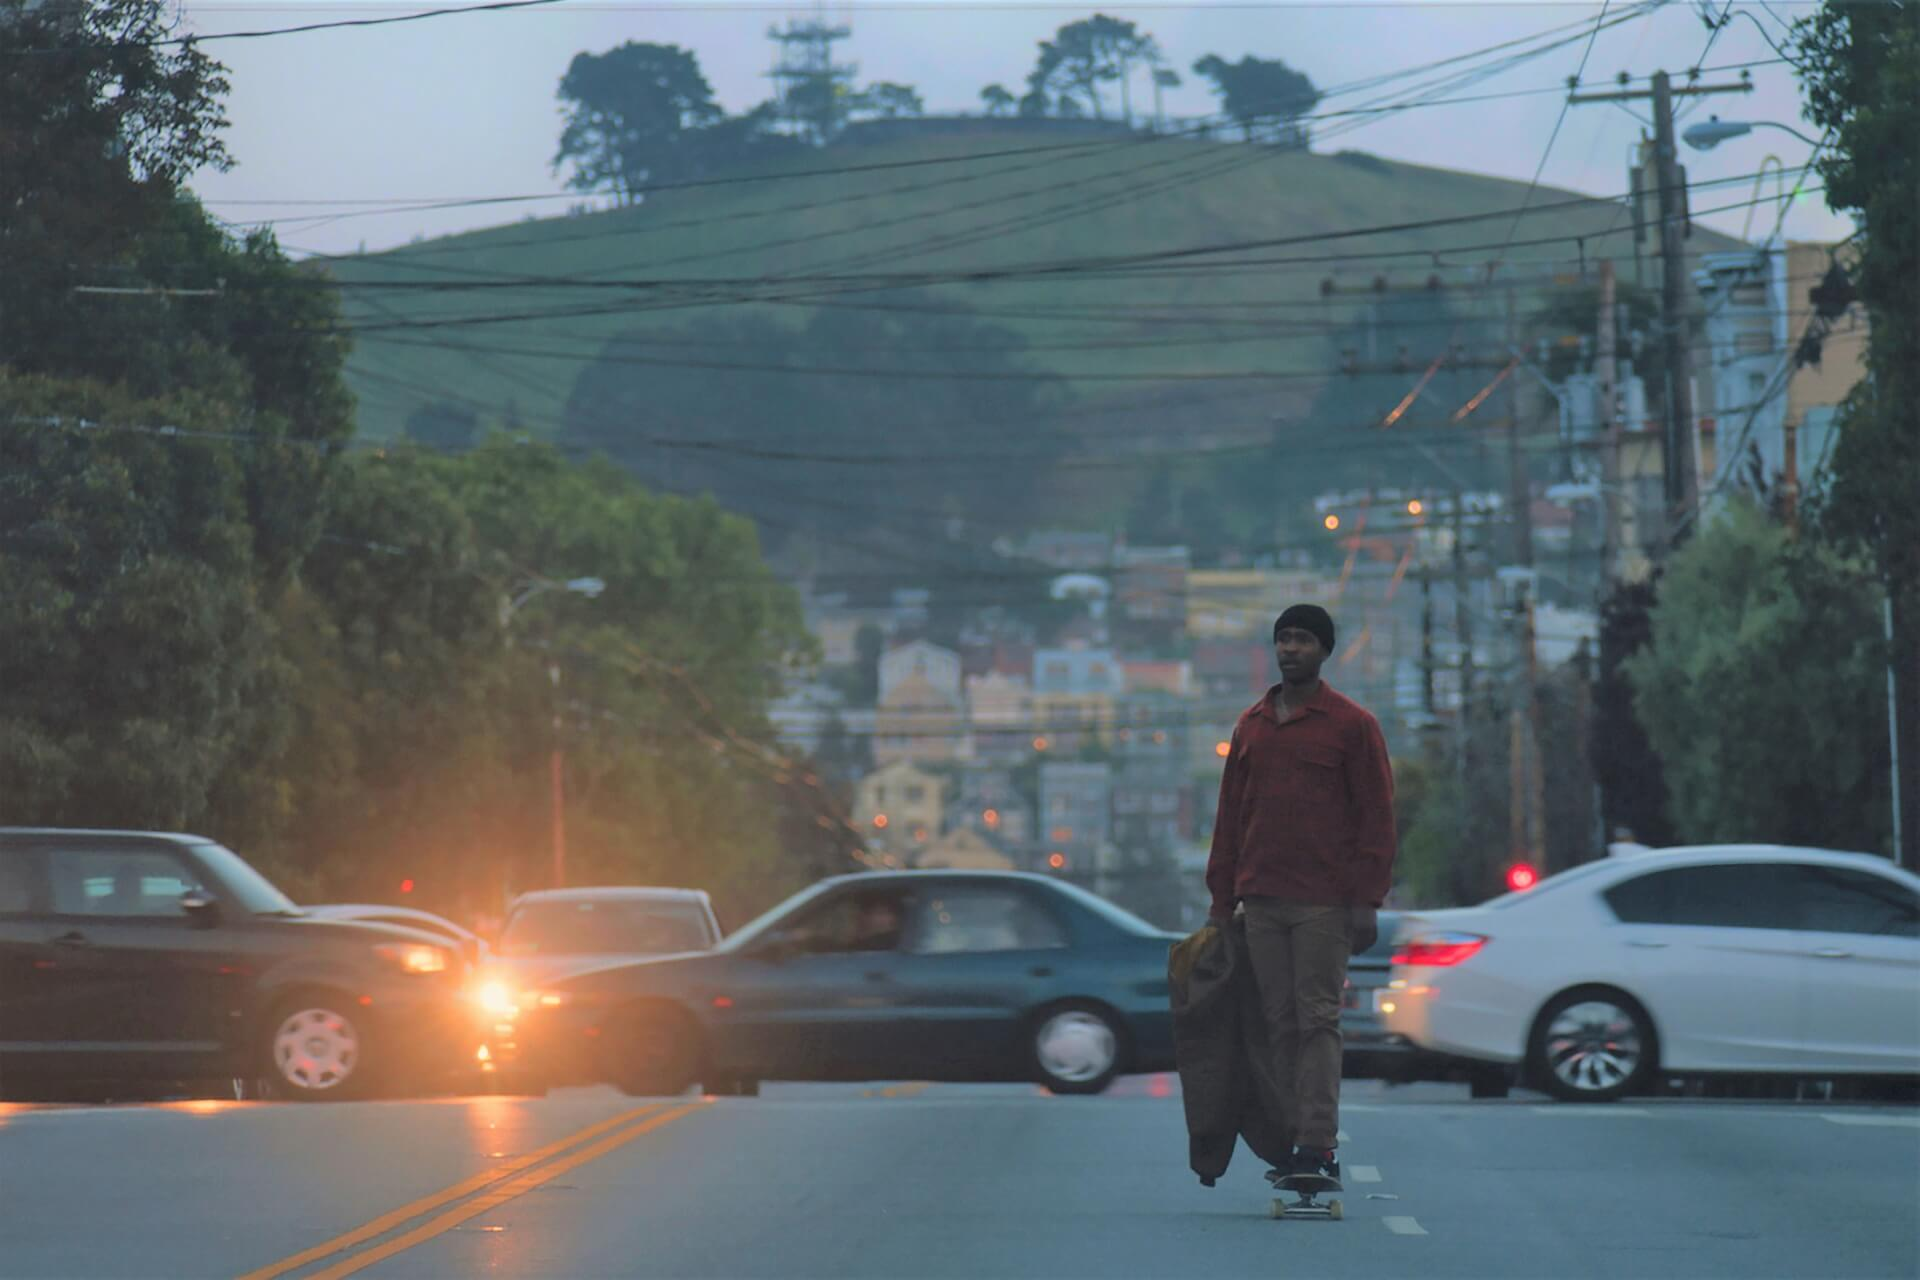 A24×プランB最新作『ラストブラックマン・イン・サンフランシスコ』のスタッフ・キャストが語る本作の魅力とは?フューチャレット映像が解禁! film2020826-lastblackman2